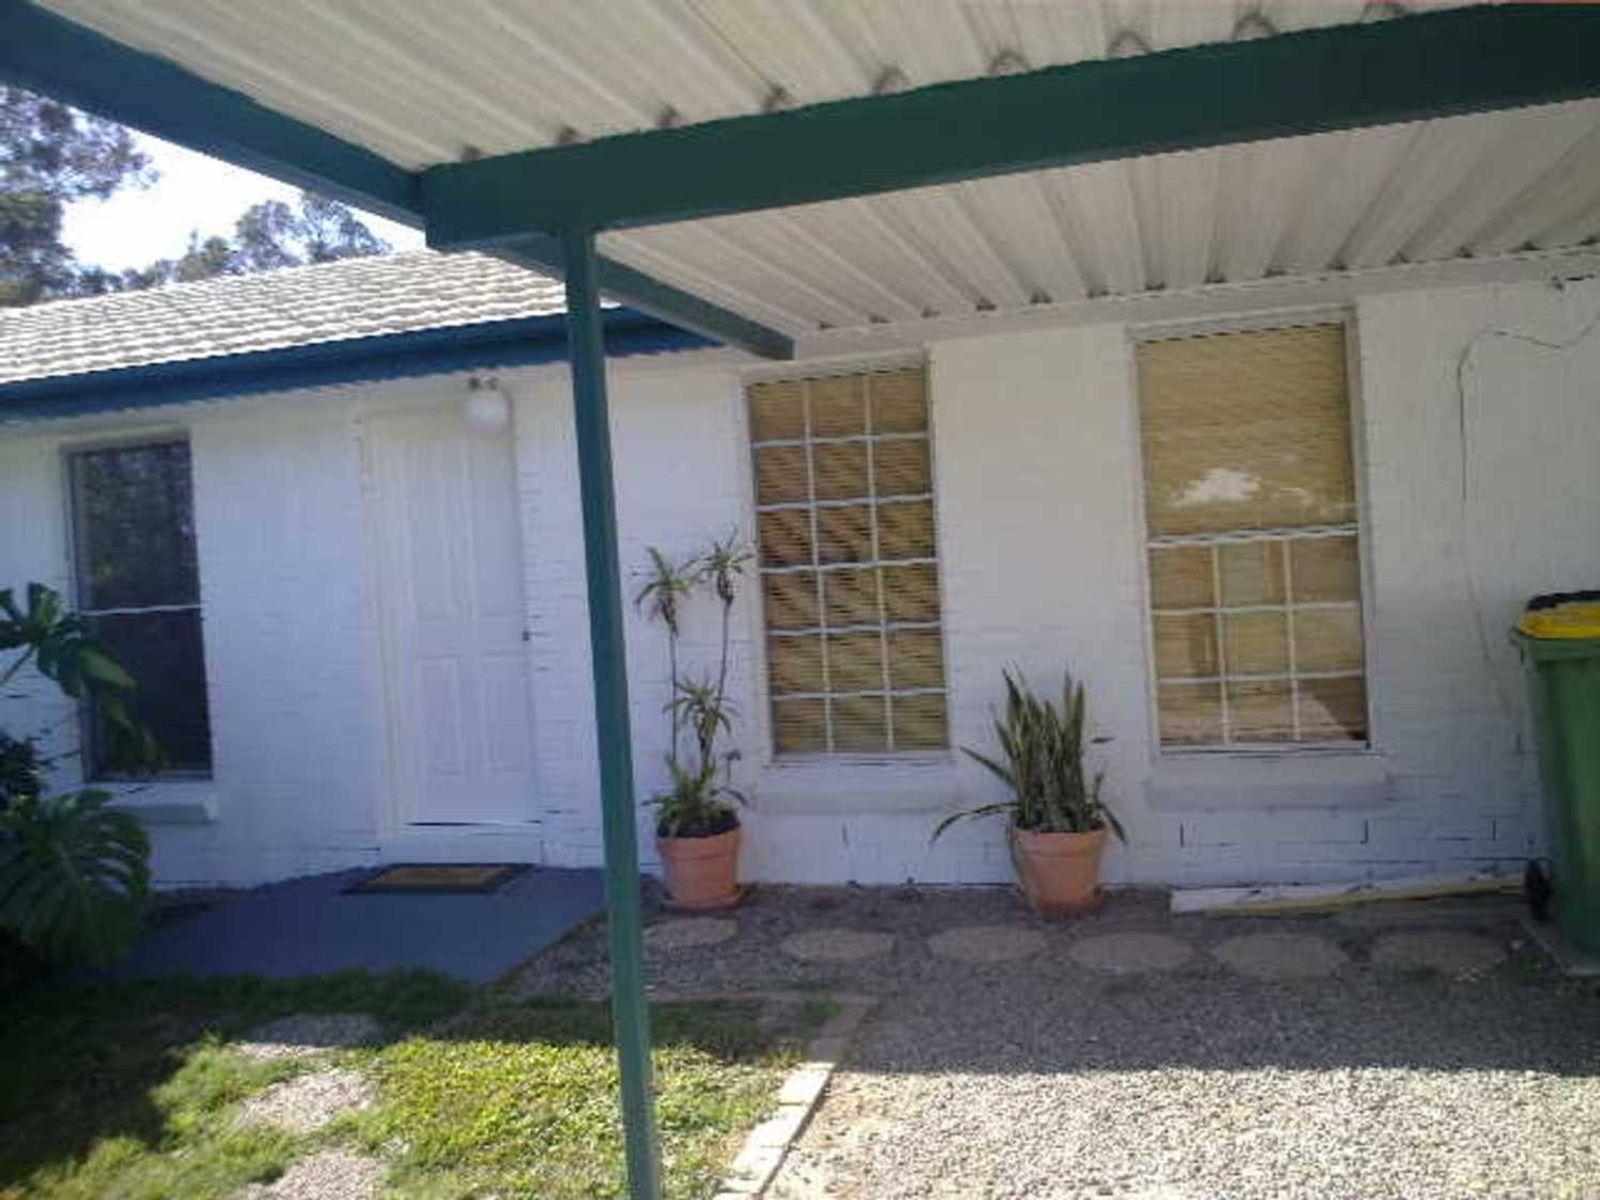 11 First Avenue, Marsden, QLD 4132